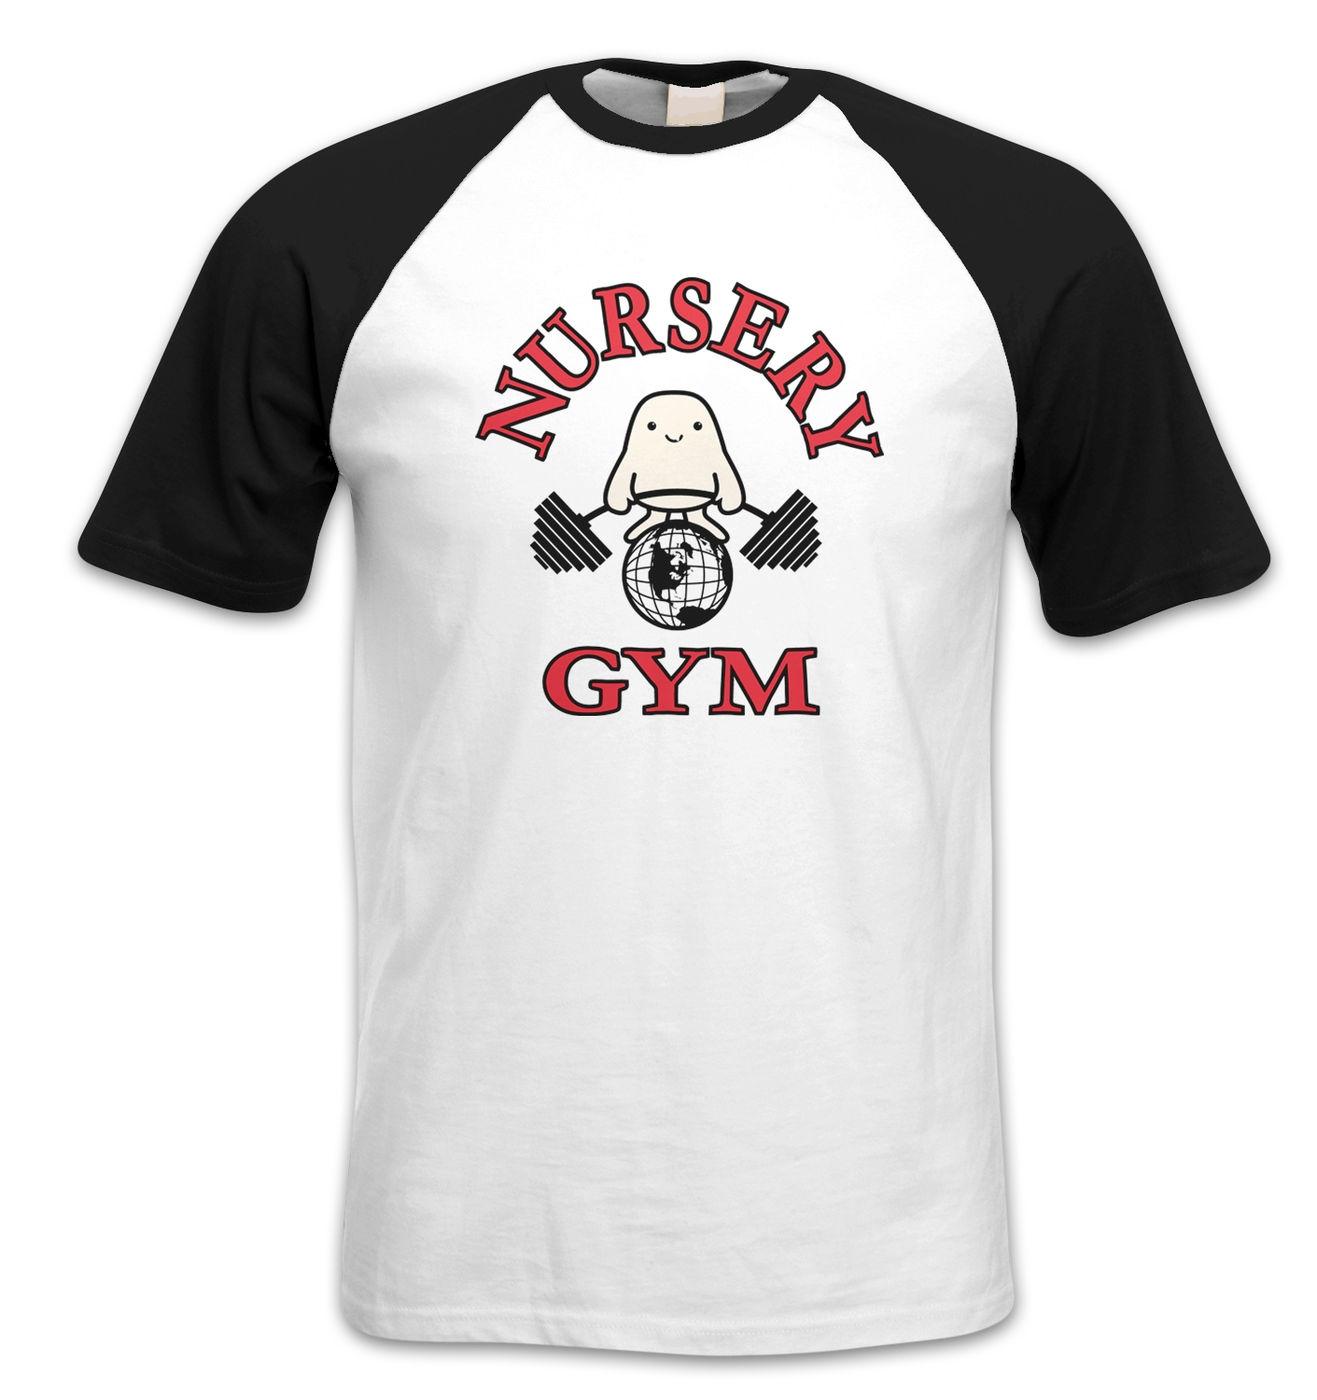 Nursery Gym short sleeve baseball t-shirt by Something Geeky